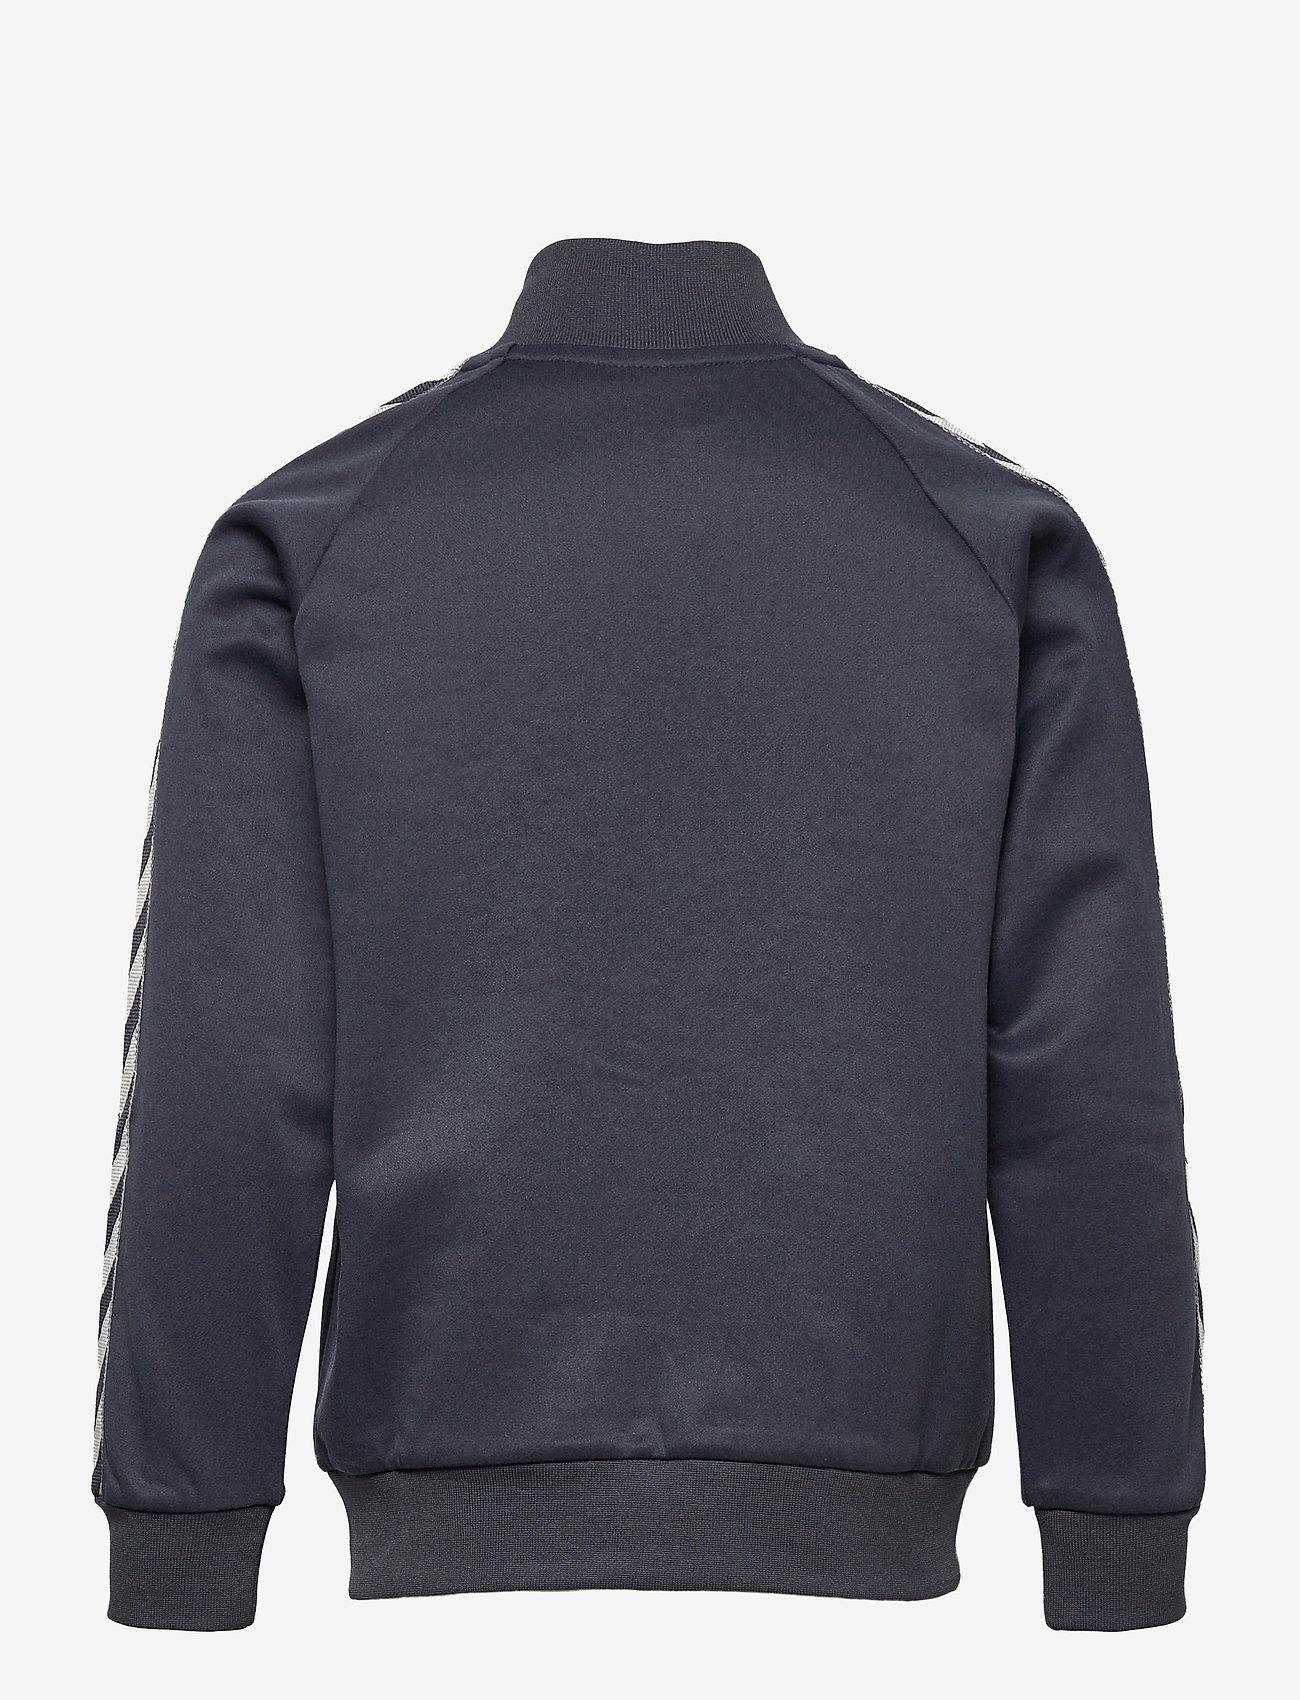 Hummel - HMLKICK ZIP JACKET - sweatshirts - ombre blue - 1